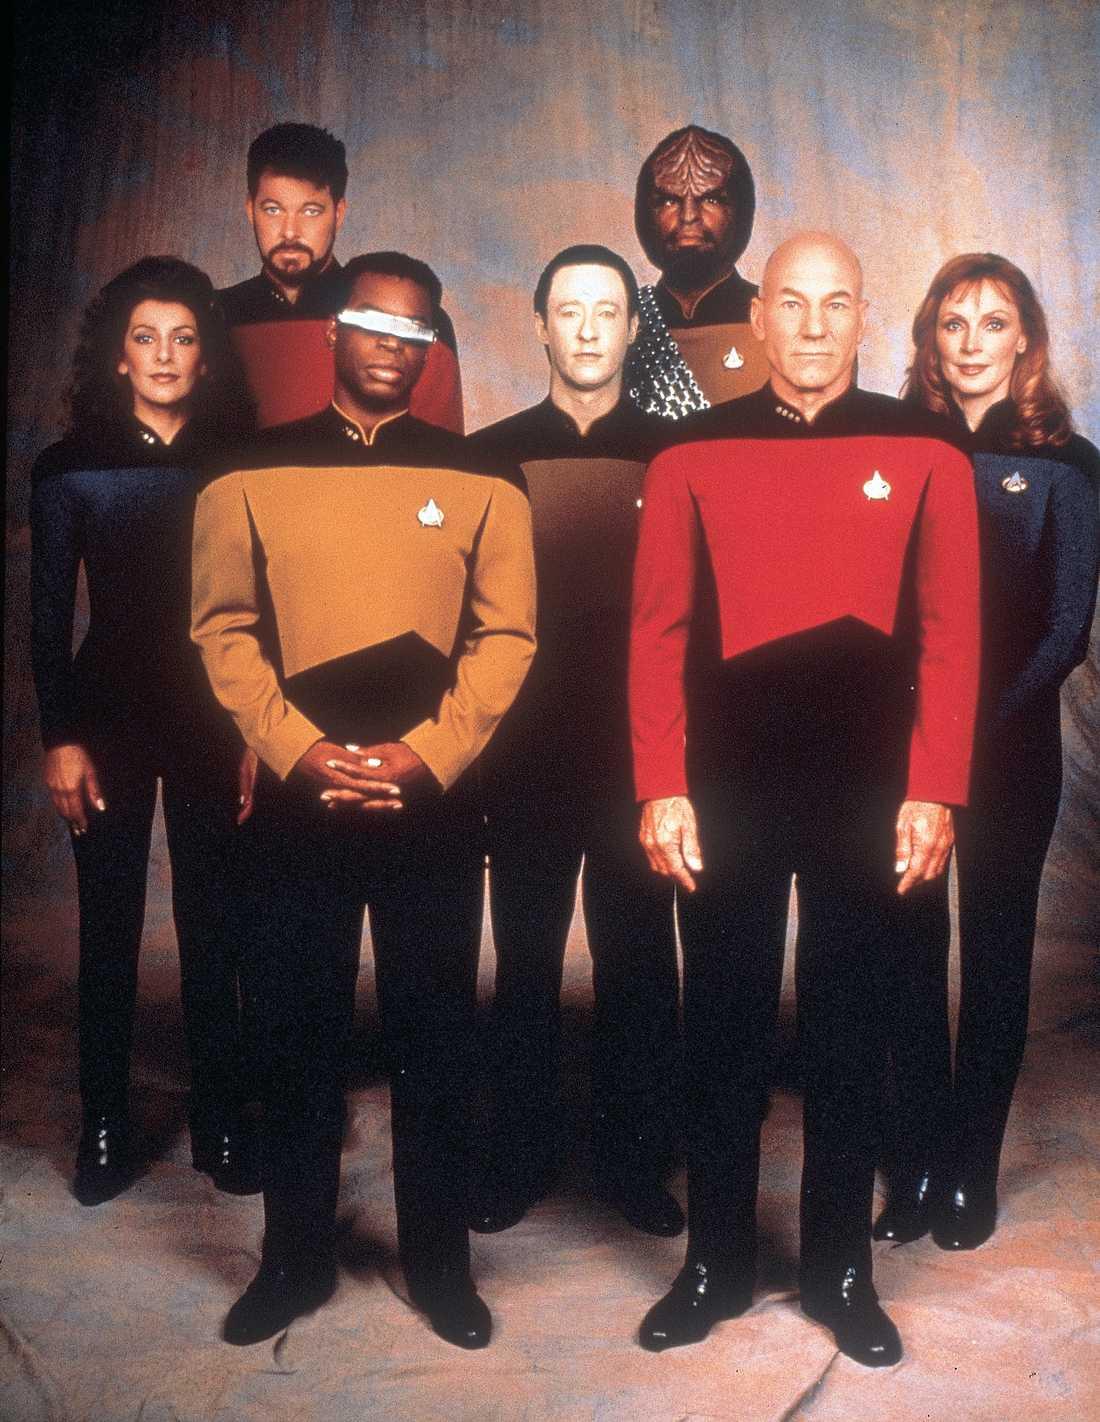 """Star Trek: The next generation"""